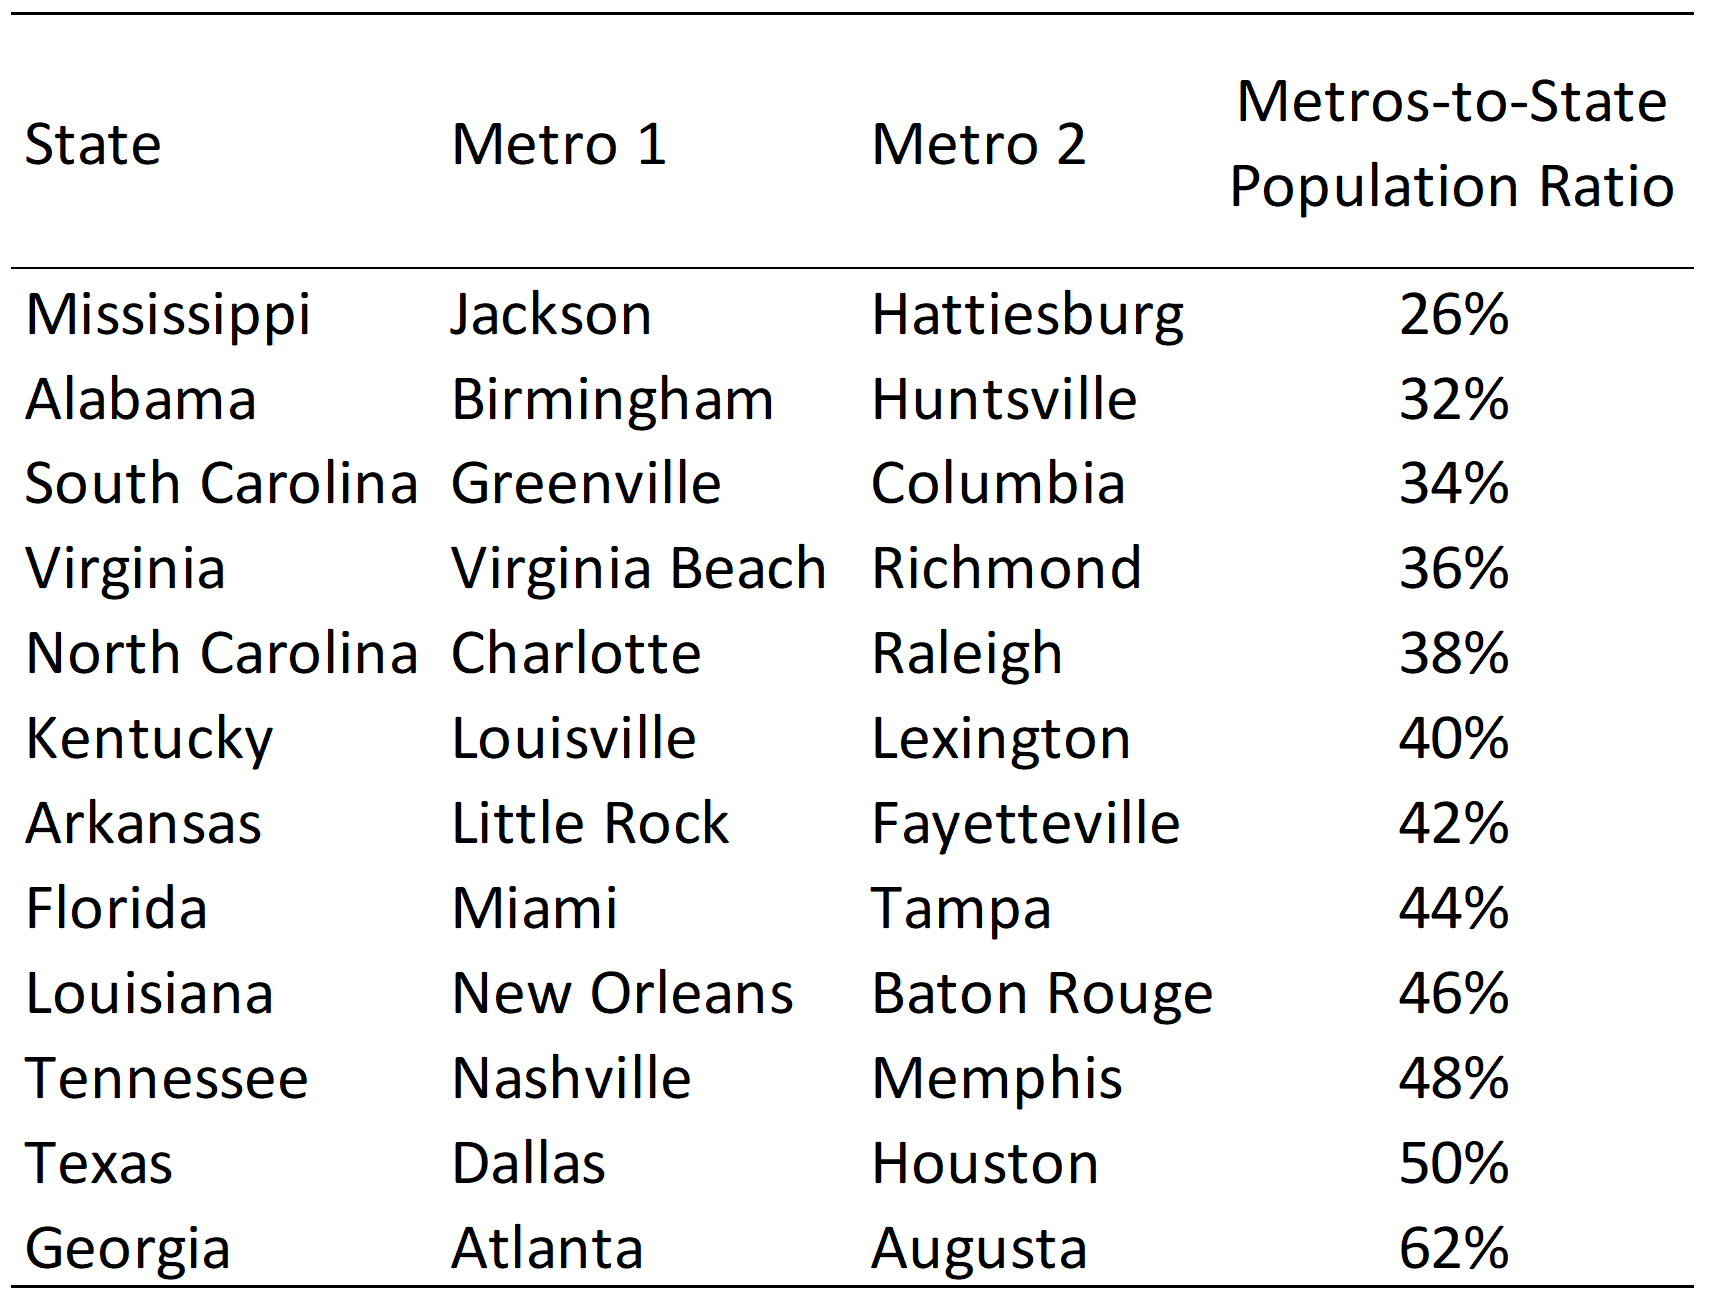 Southern-State Metro Population Ratios (2019 Estimates)